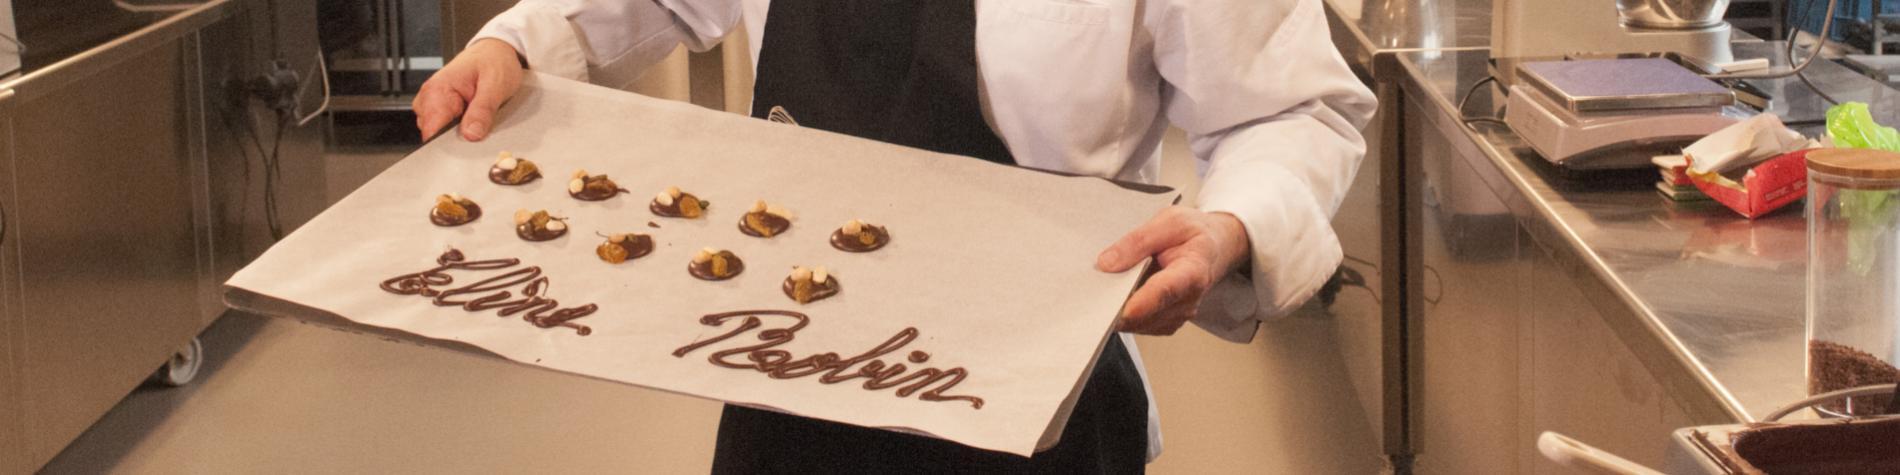 Chocolaterie Darcis à Verviers - artisan pâtissier - chocolatier belge